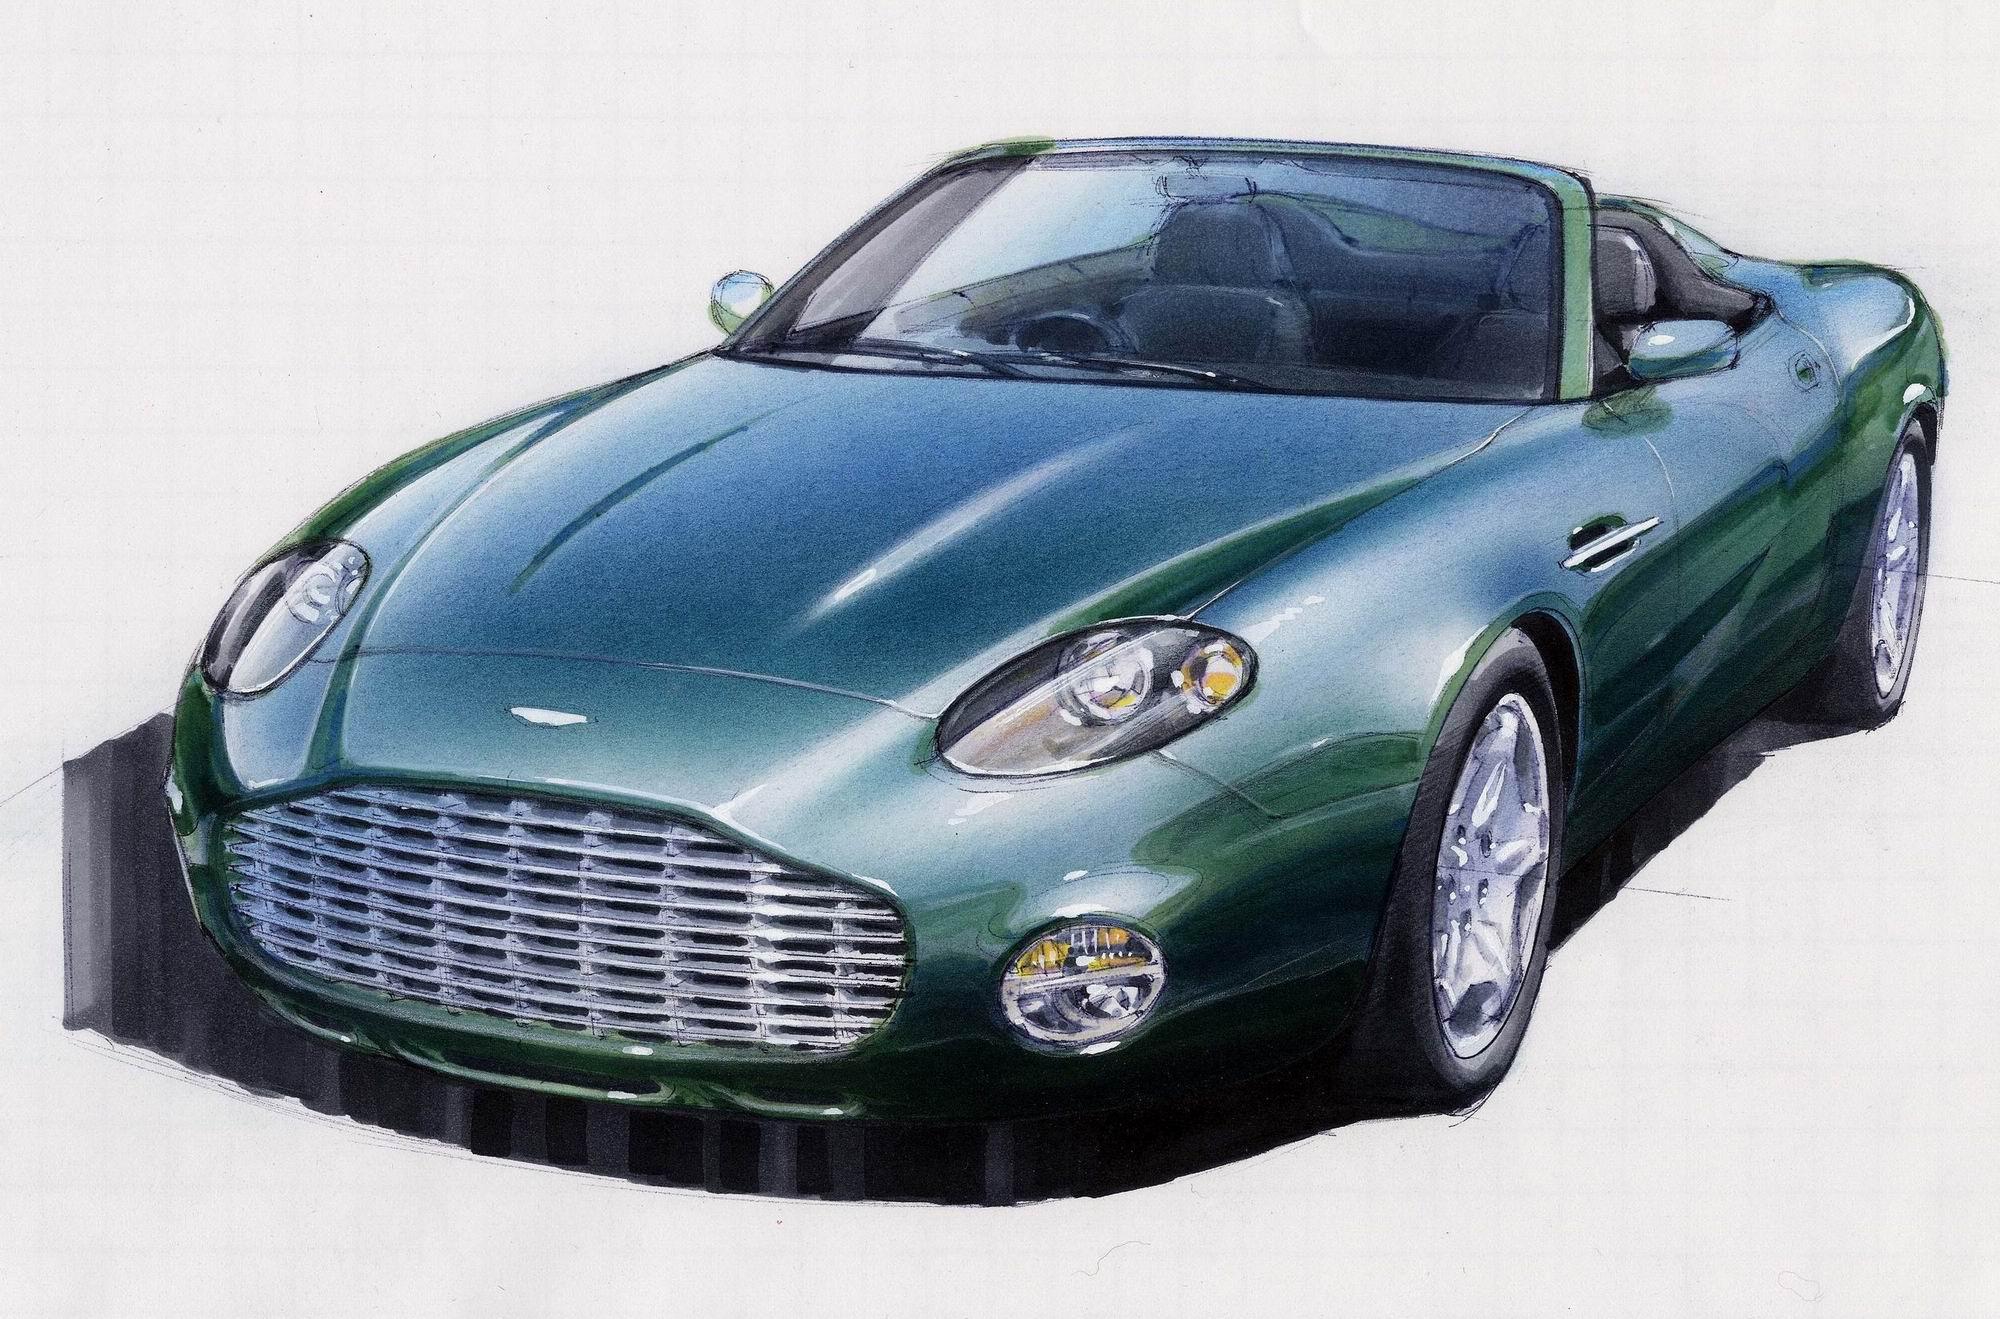 Aston Martin V8 Vantage  2005  2006 Models 309009 in addition Scalextric C2790 Aston Martin Dbr9 further 13350 furthermore Img652 in addition Interior 68684233. on 2006 aston martin